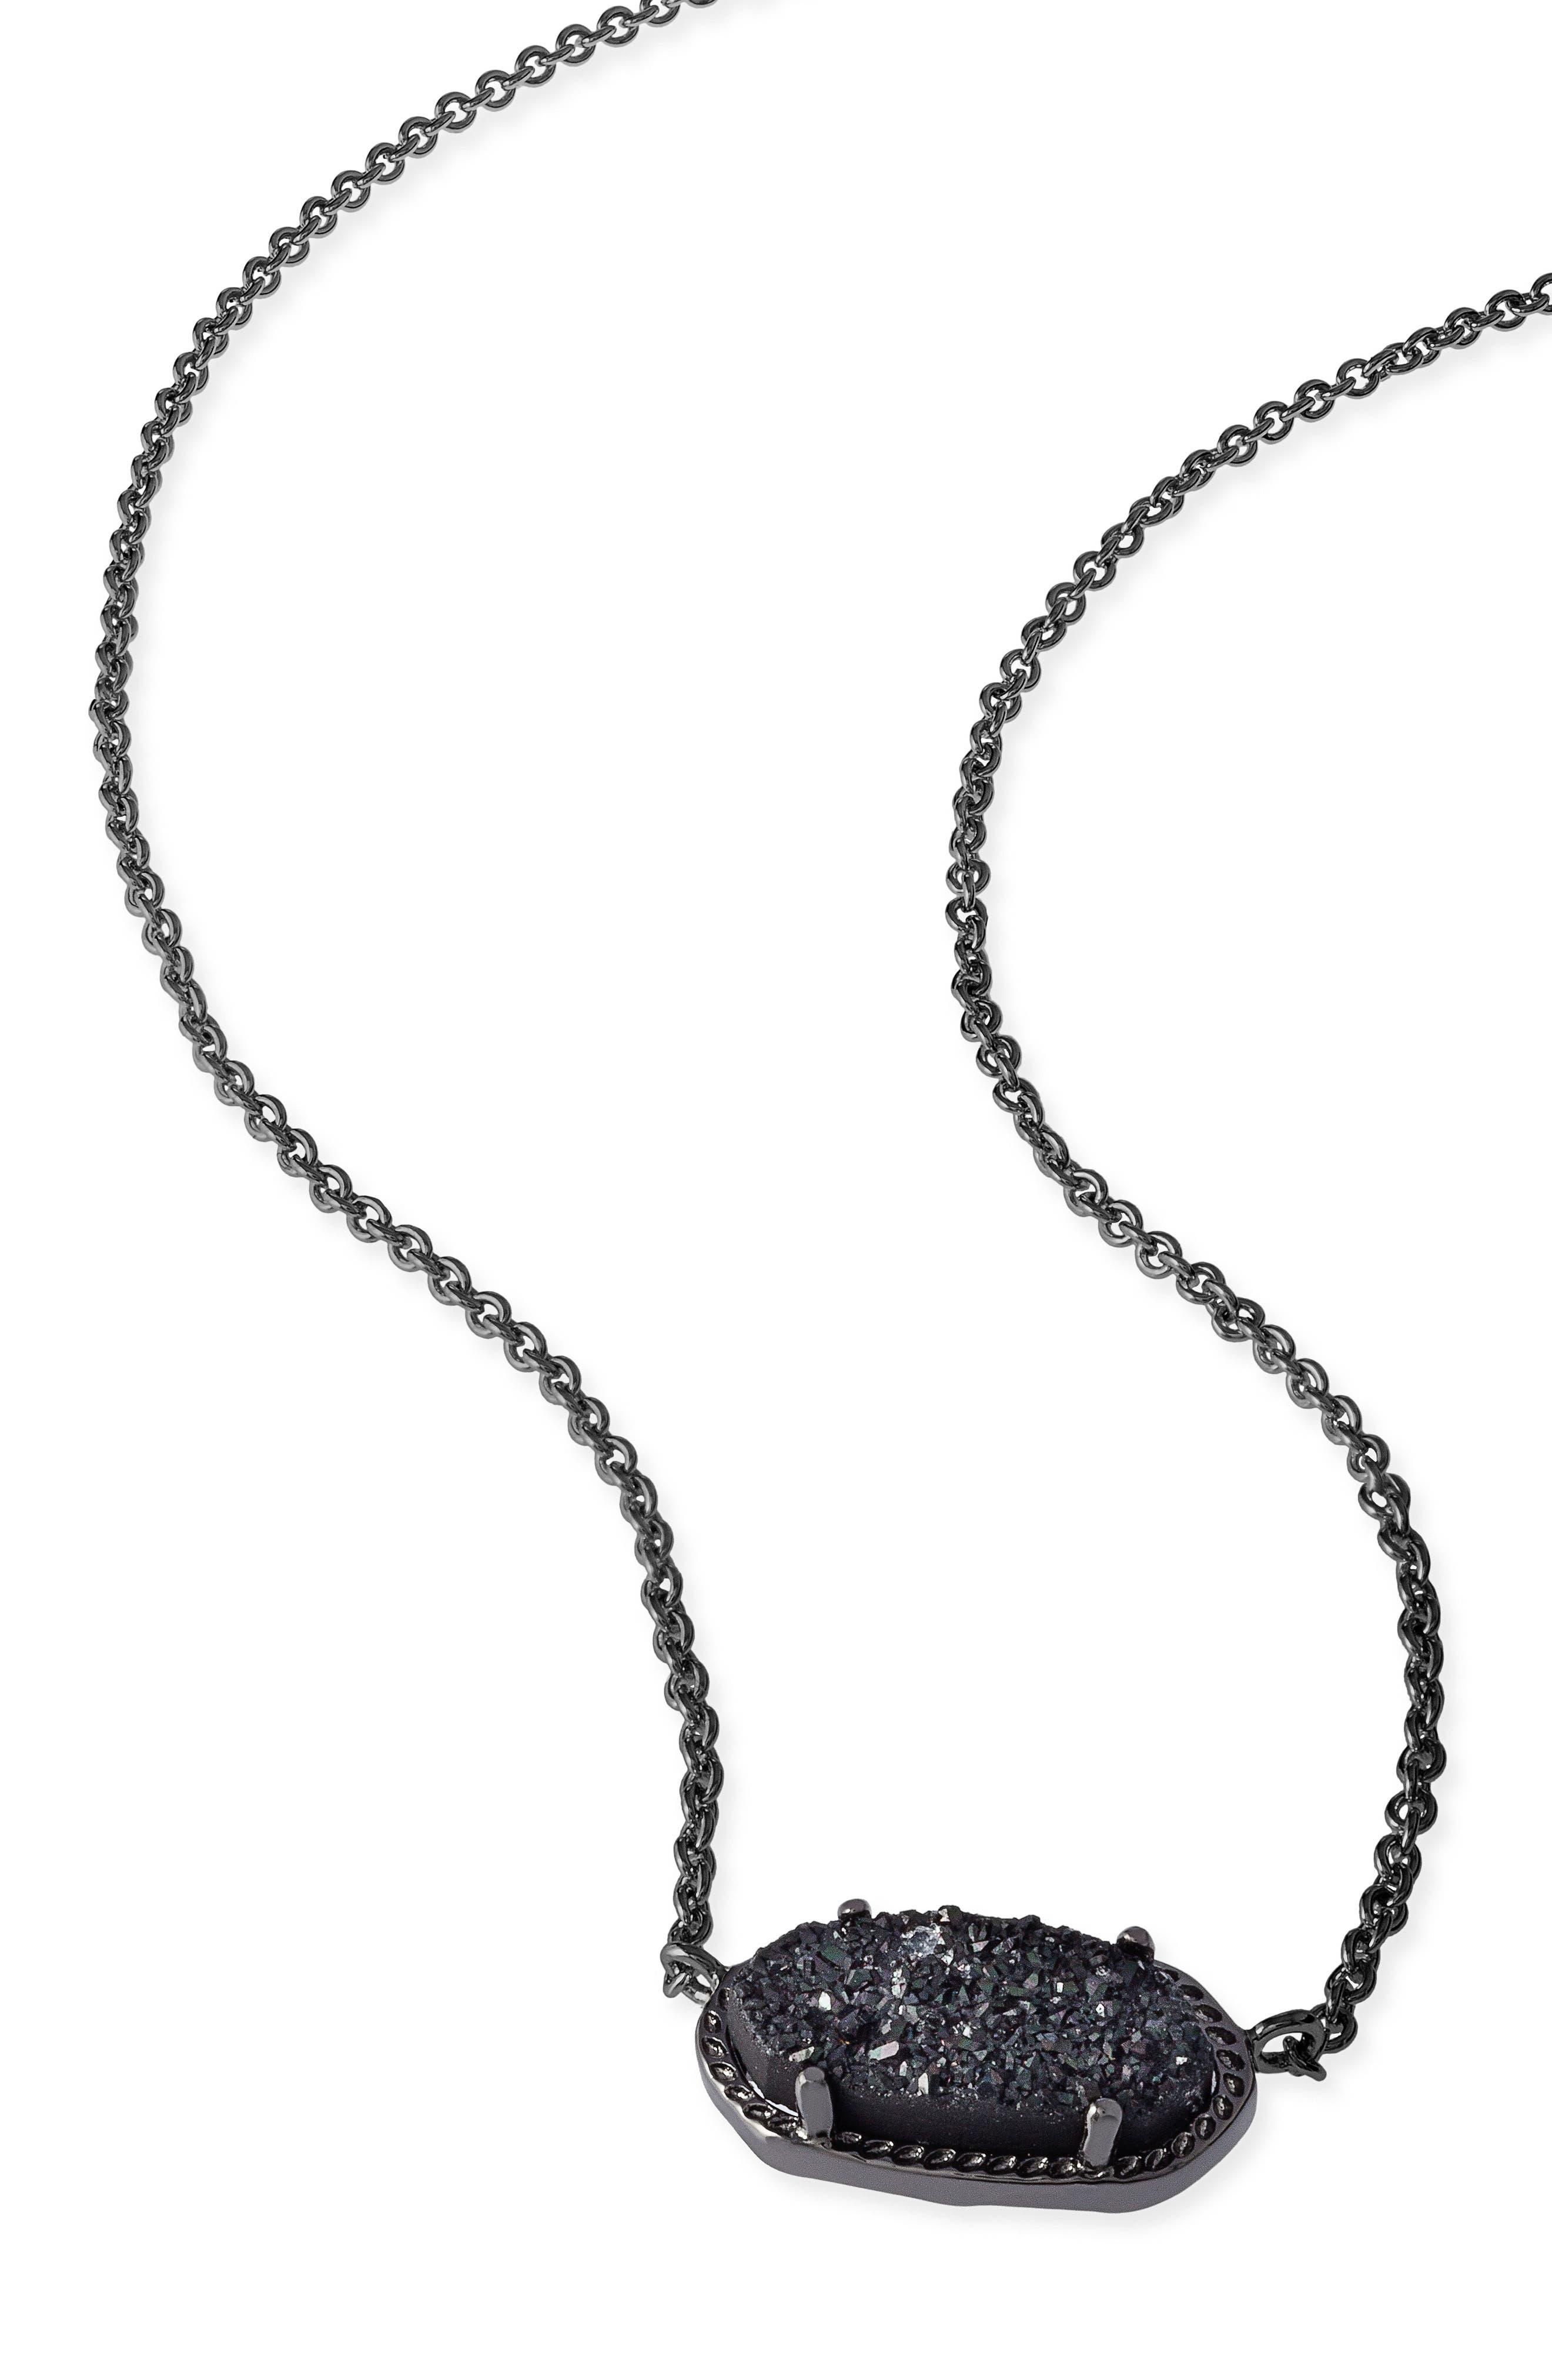 Elisa Pendant Necklace,                             Alternate thumbnail 5, color,                             GUNMETAL/ BLACK DRUSY